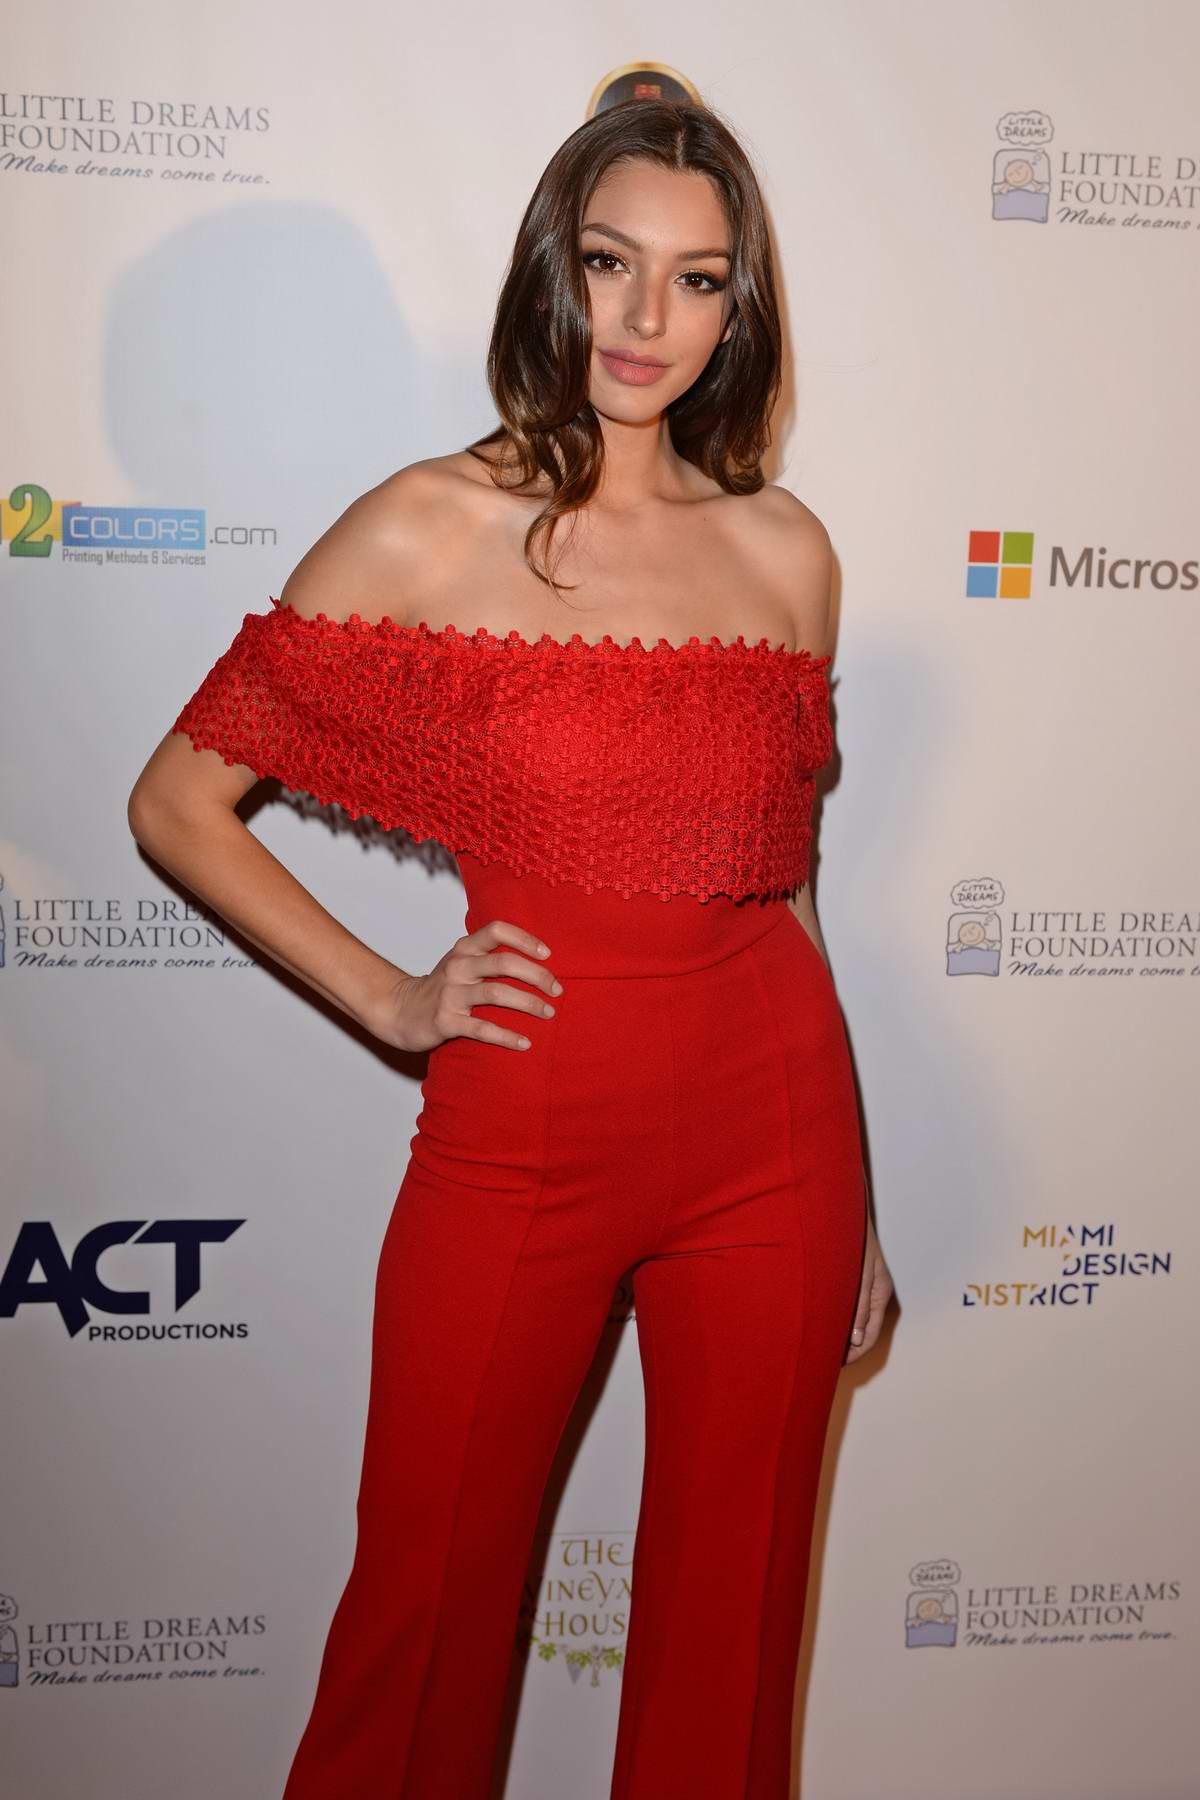 Celine Farach attends Little Dreams Foundation Gala in Miami beach, Florida